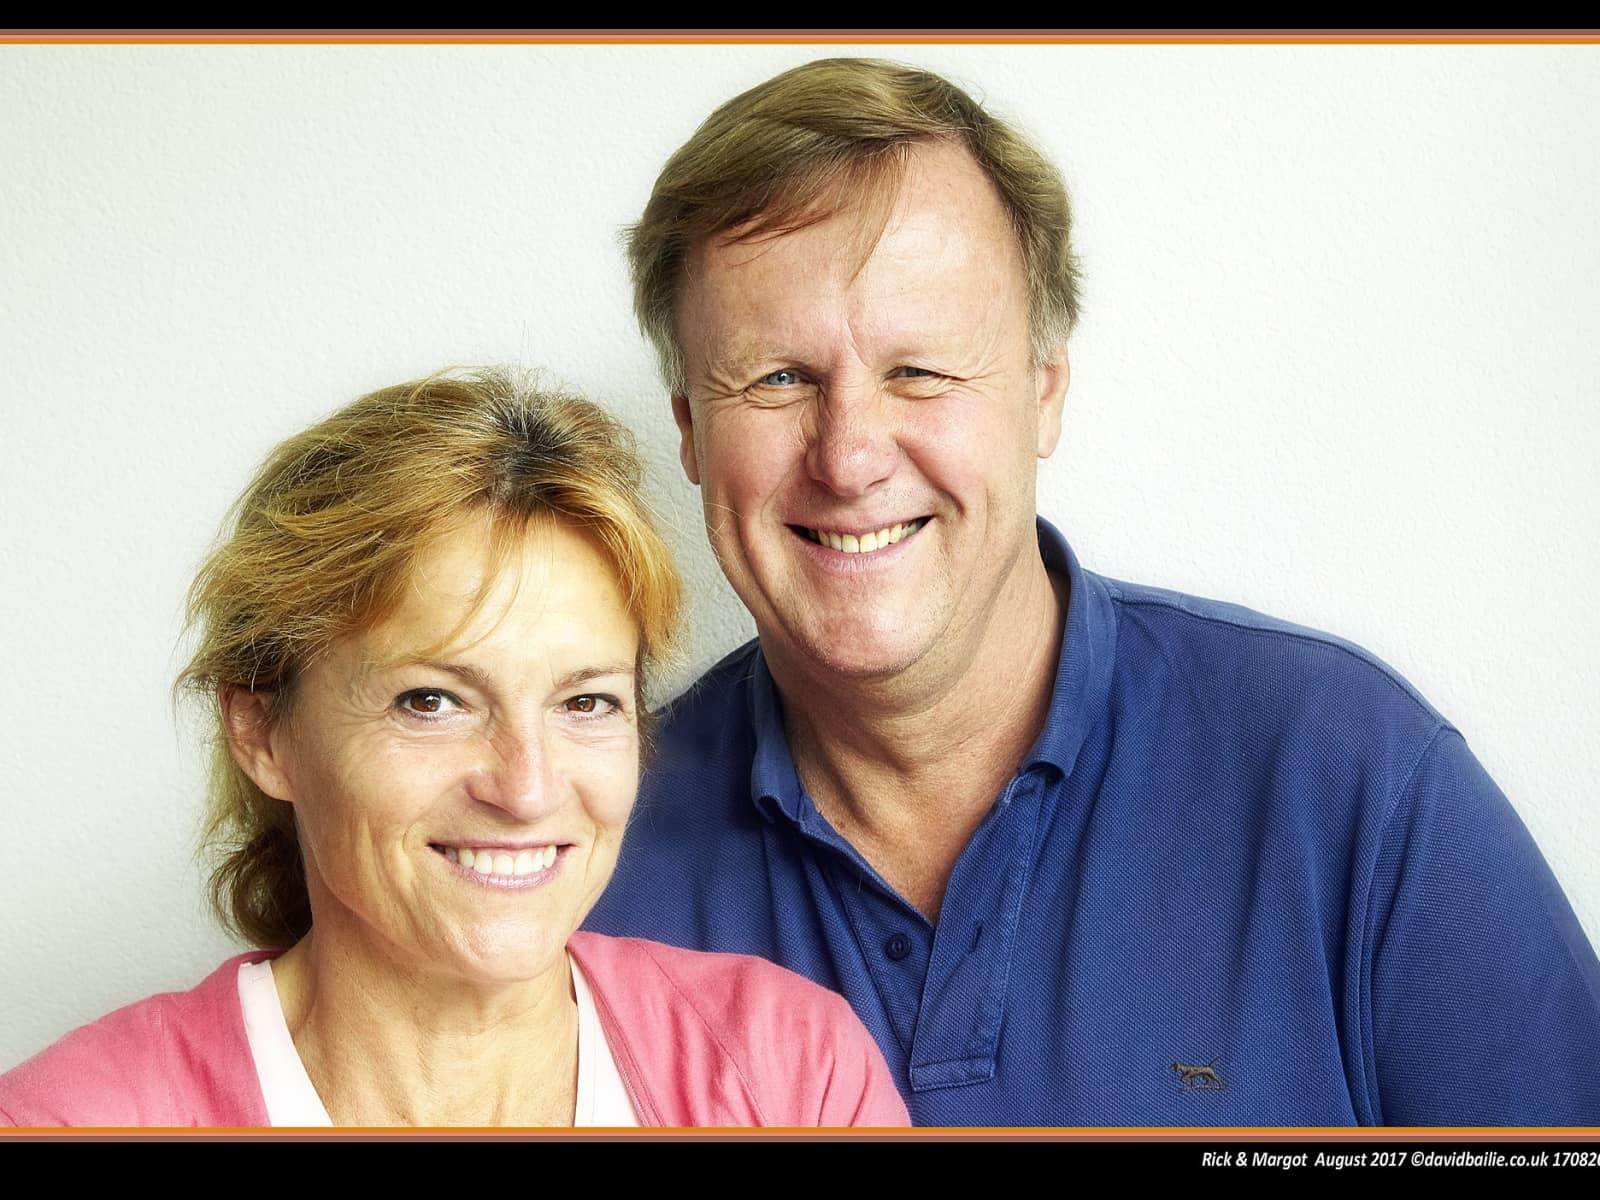 Rick & Margot from The Hague, Netherlands